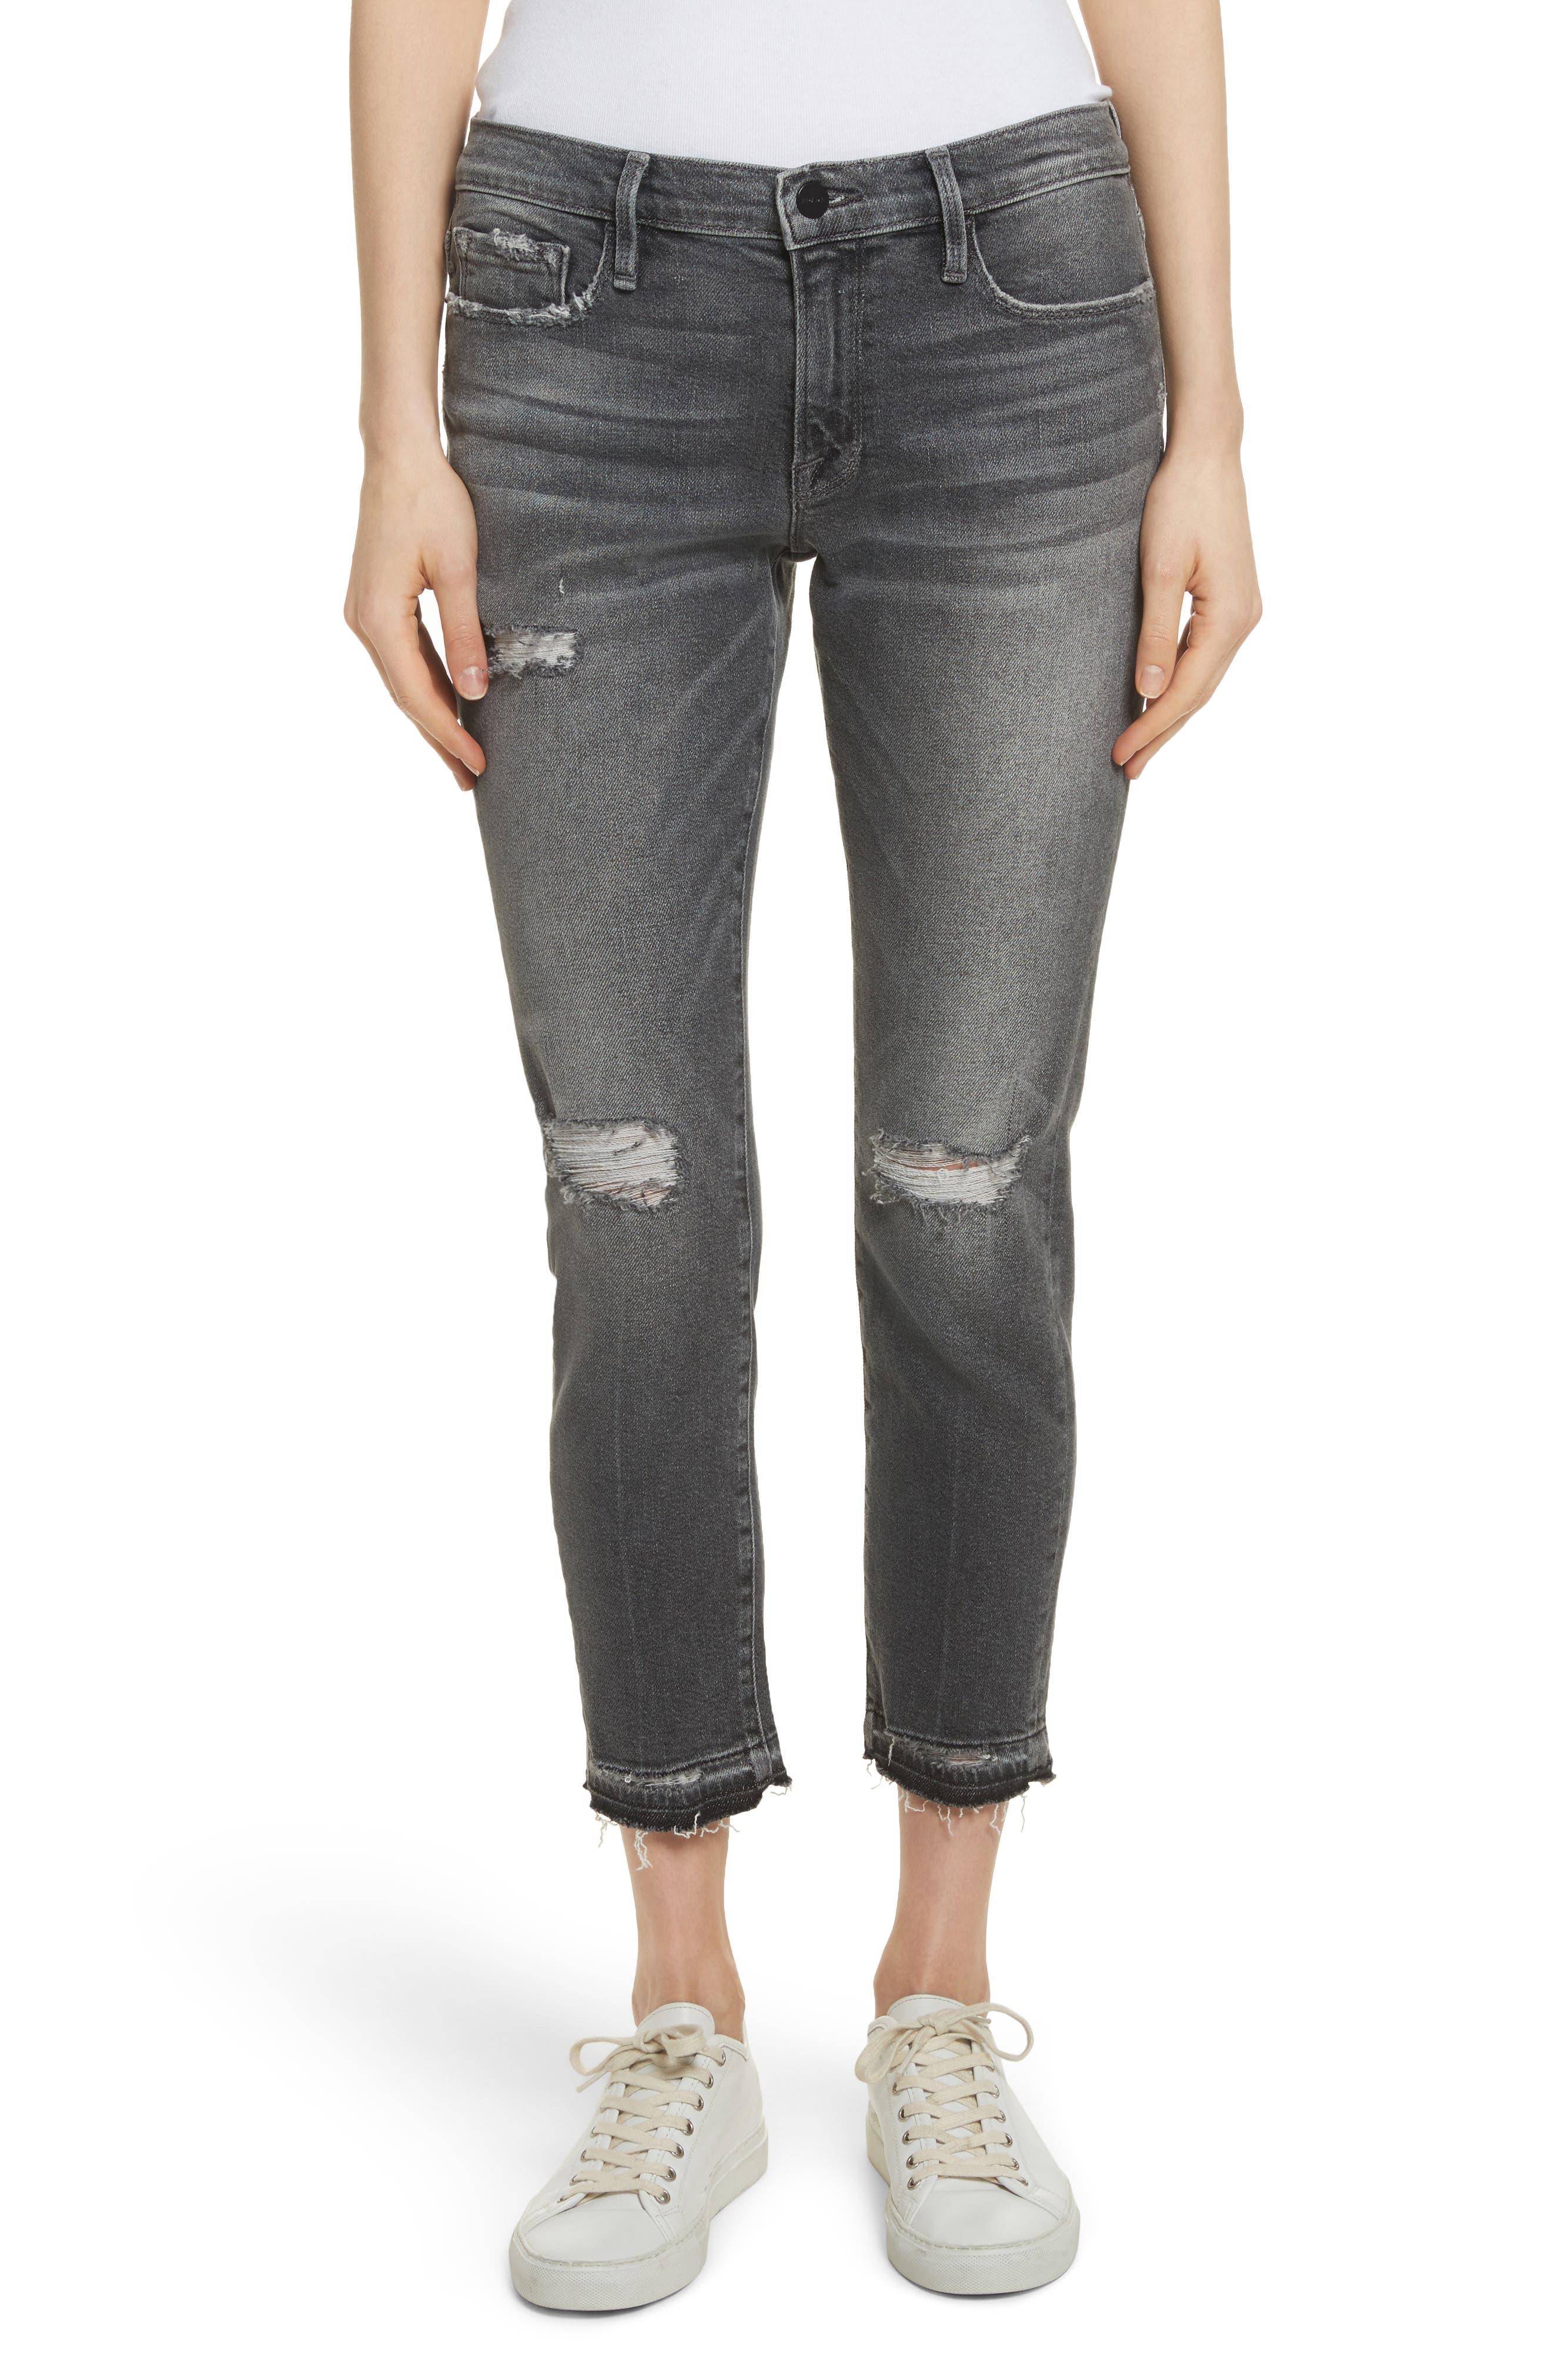 Le Garçon Ripped Released Hem Slim Jeans,                             Main thumbnail 1, color,                             Stockcross